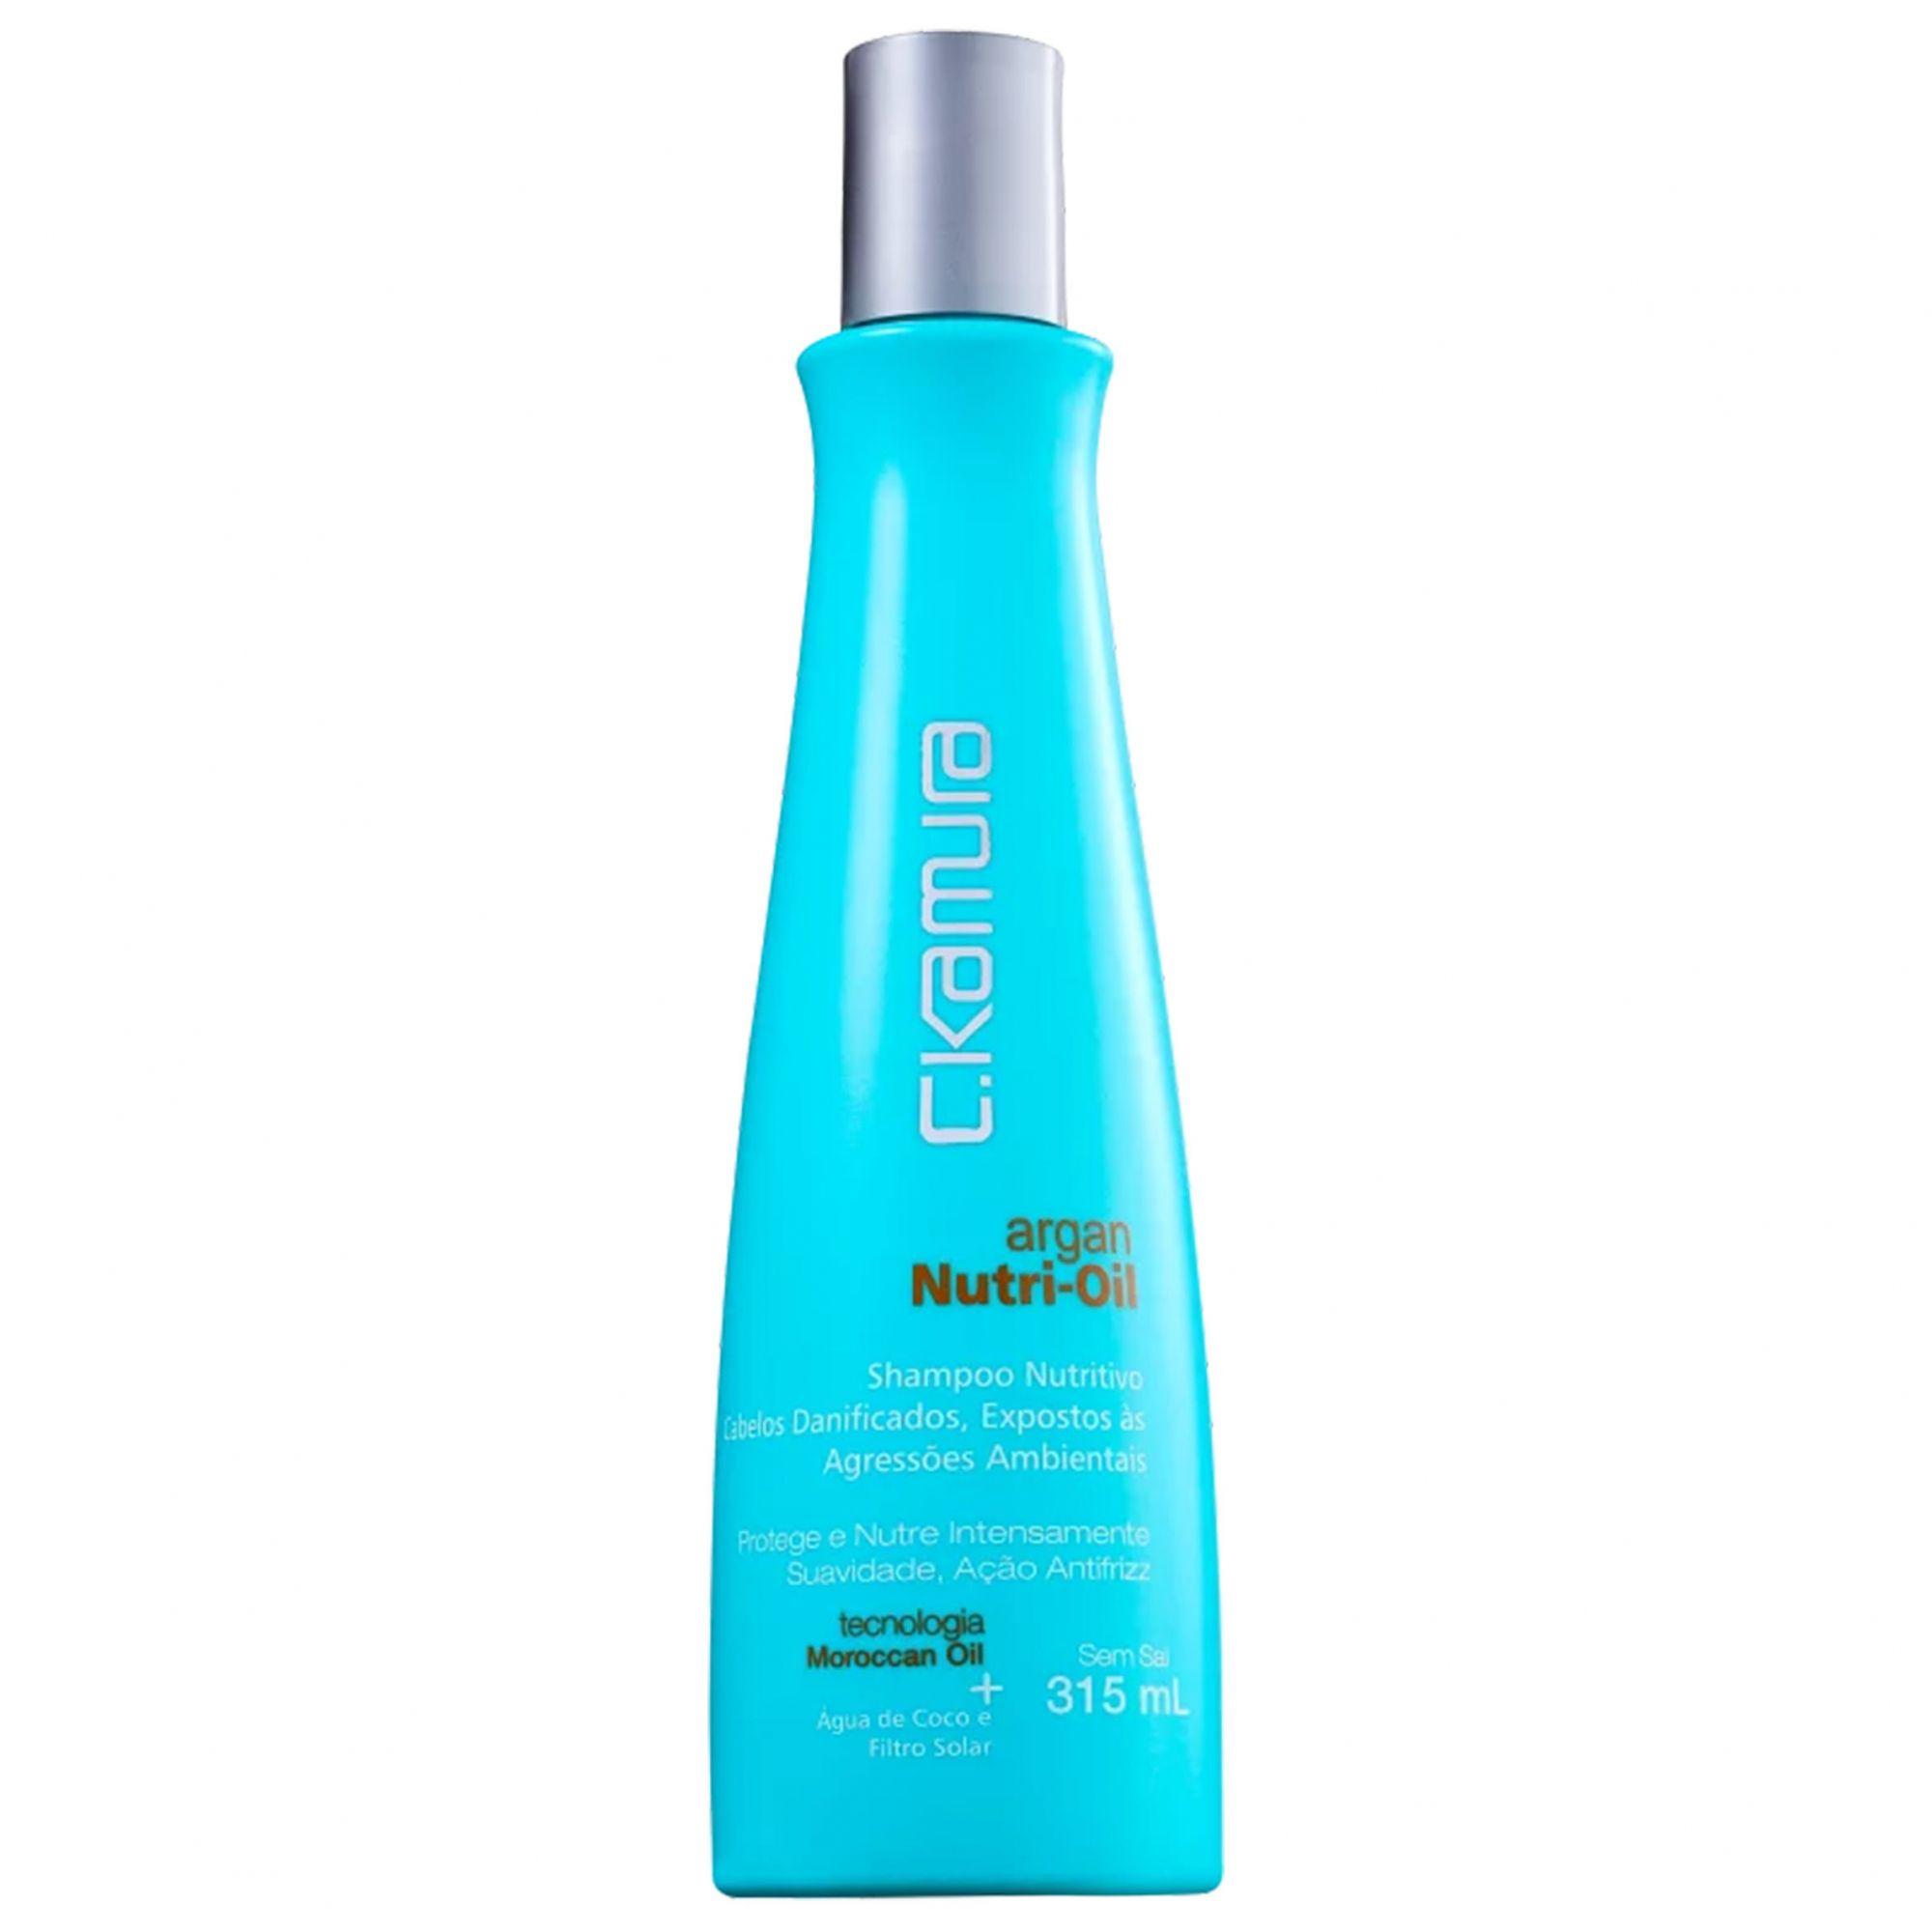 C.Kamura Argan Nutri-Oil - Shampoo 315ml.